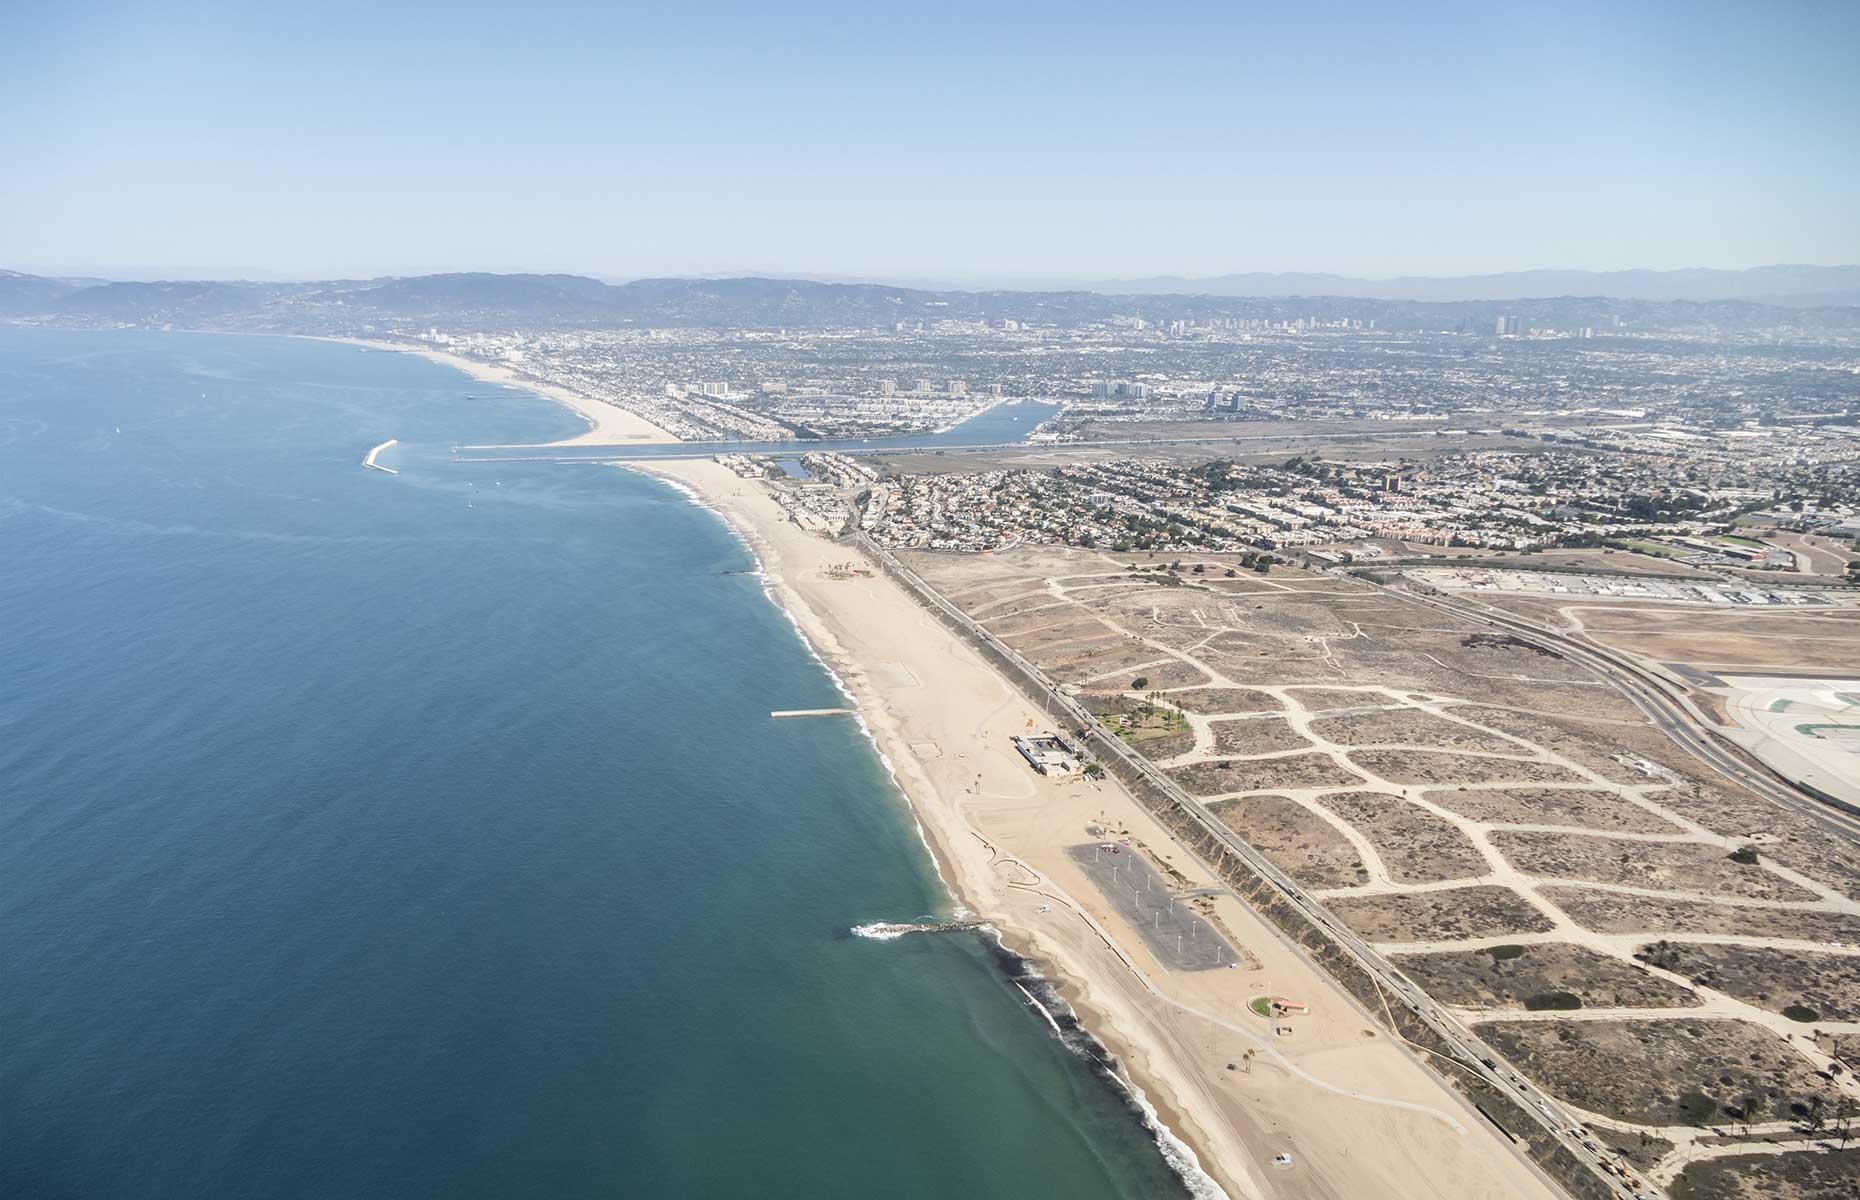 https://loveincstatic.blob.core.windows.net/loveexploring/IMAGES/Guide-to-Los-Angeles-best-beaches/dockweiler-beach.jpg